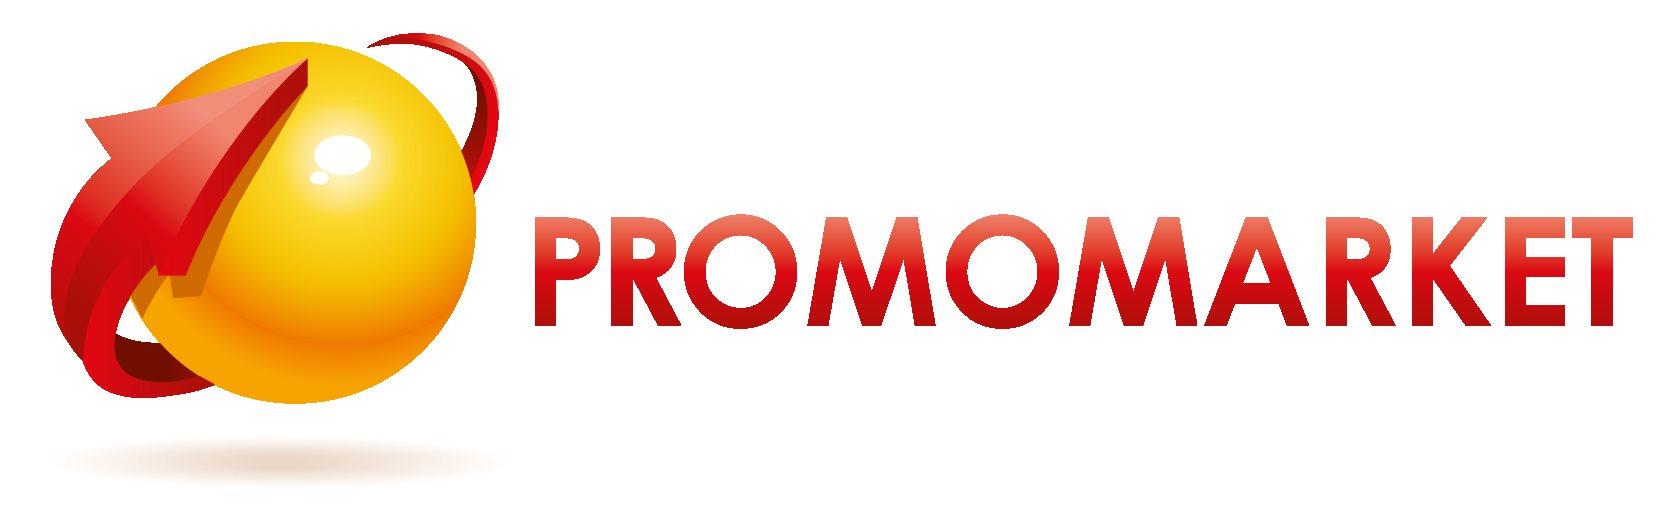 Promomarket S.A.C